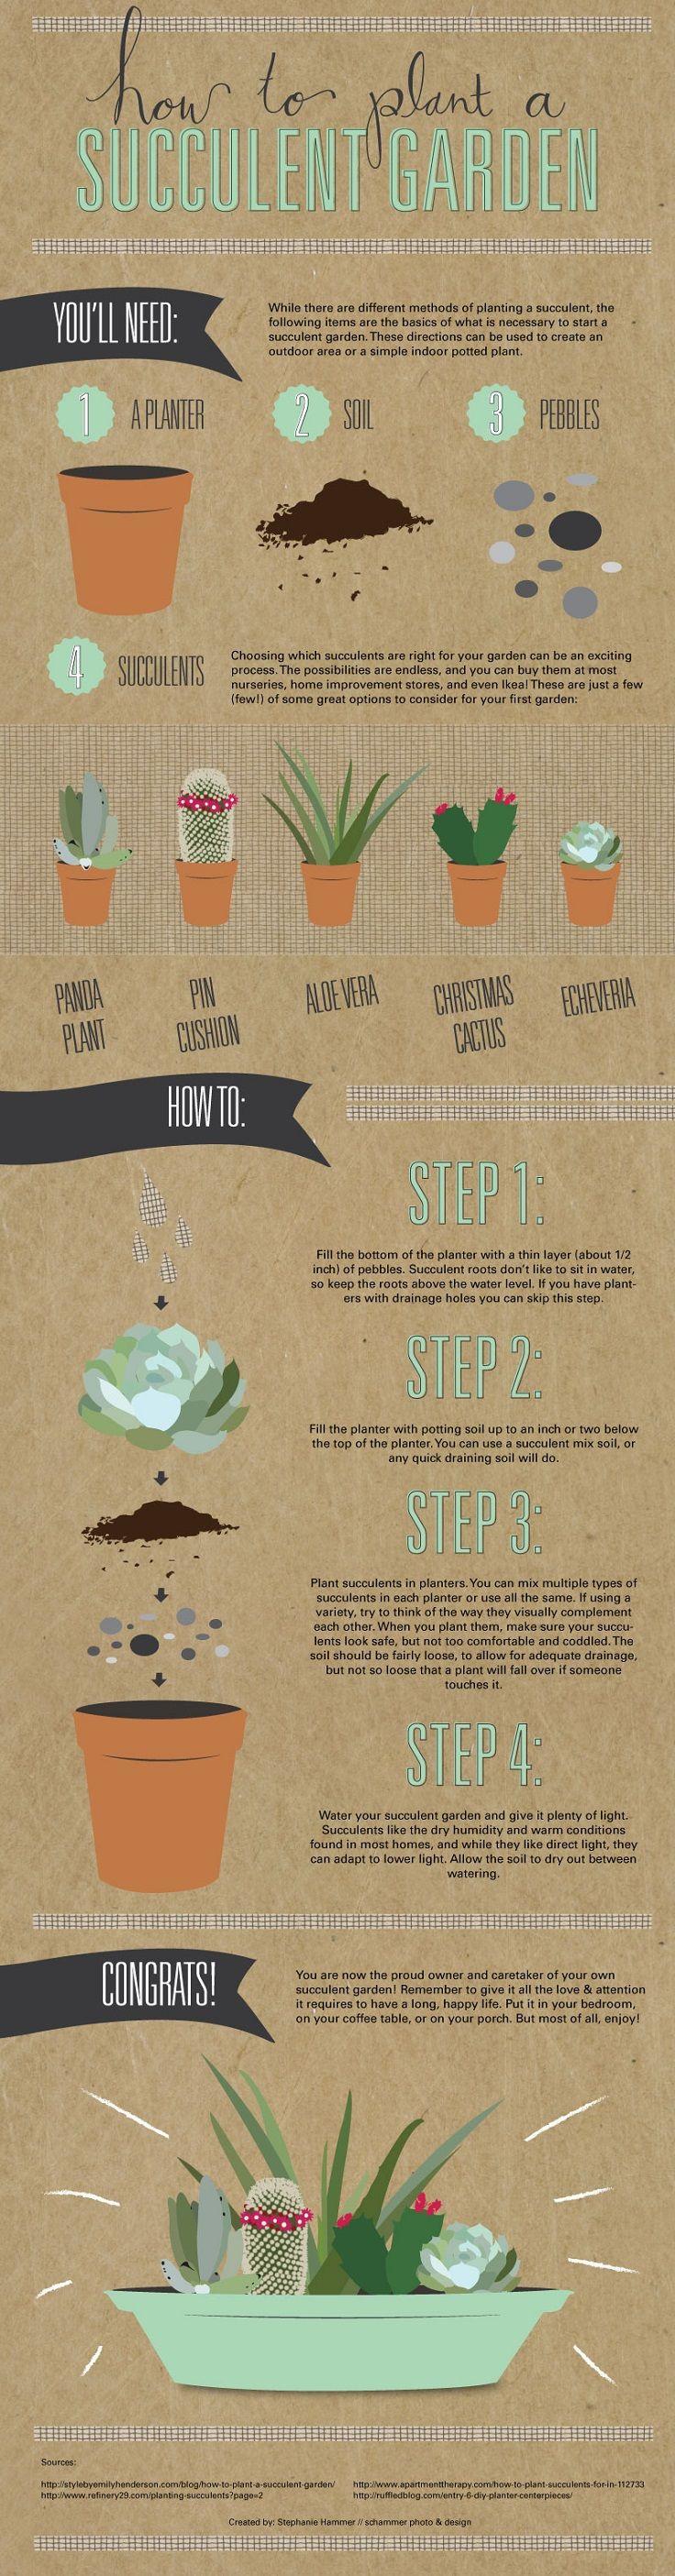 TOP 10 DIY Outdoor Succulent Garden Ideas | DIY | Pinterest | Small ...